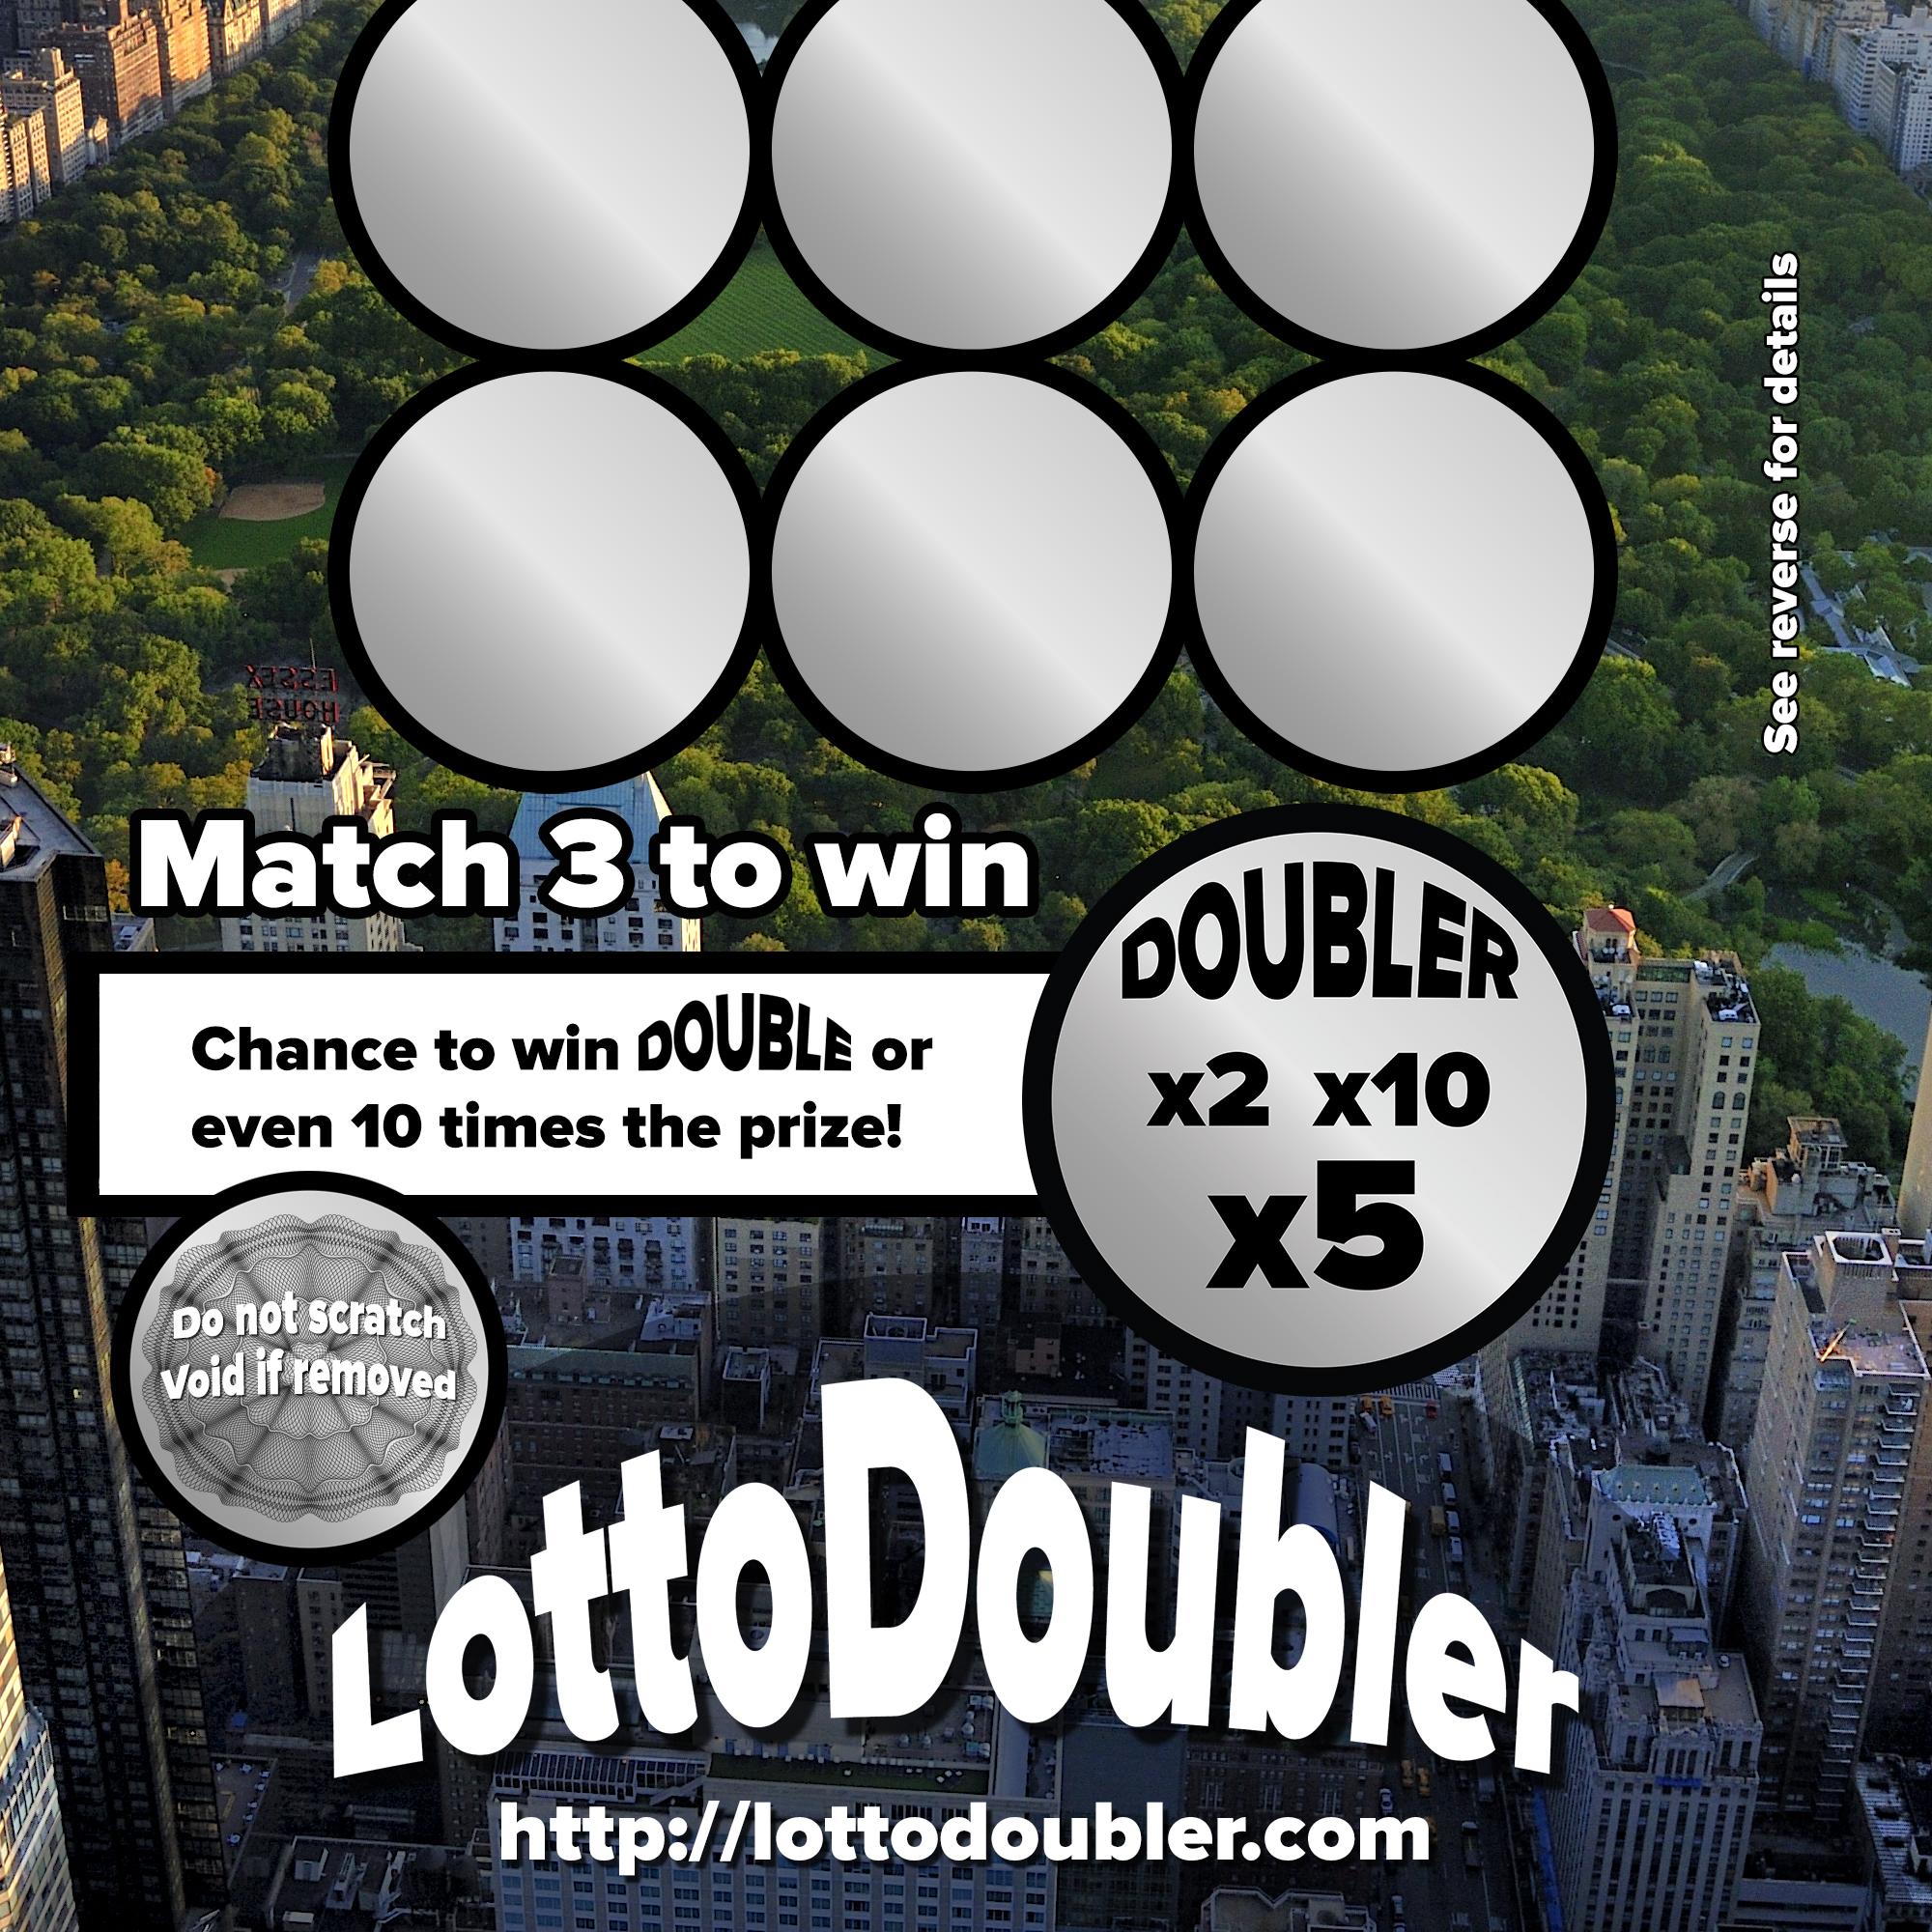 Avatar - Lottodoubler